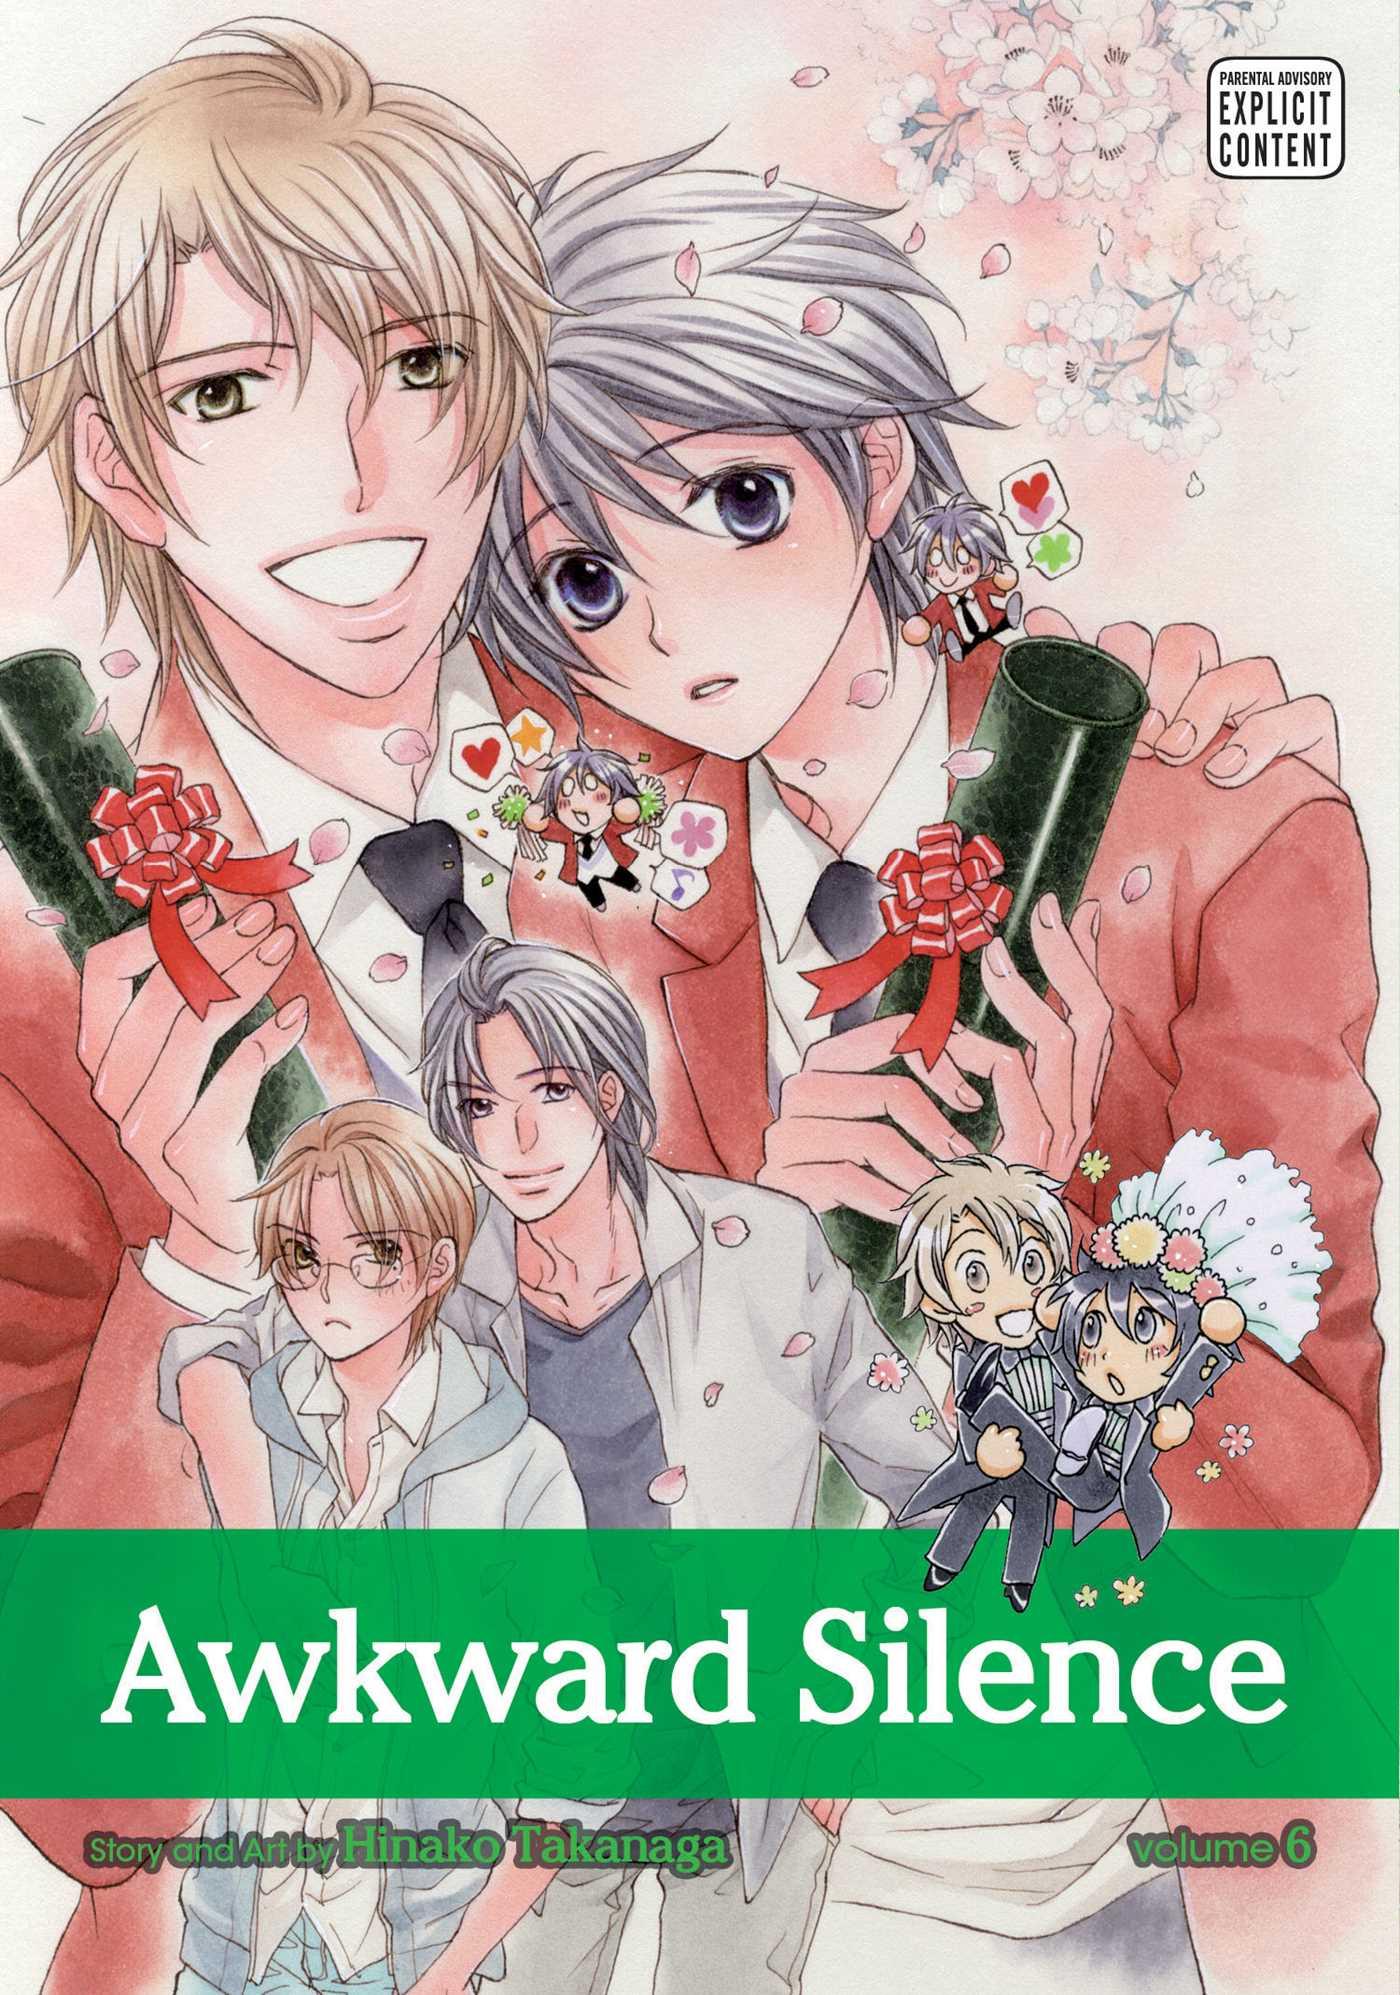 Awkward silence vol 6 9781421593692 hr